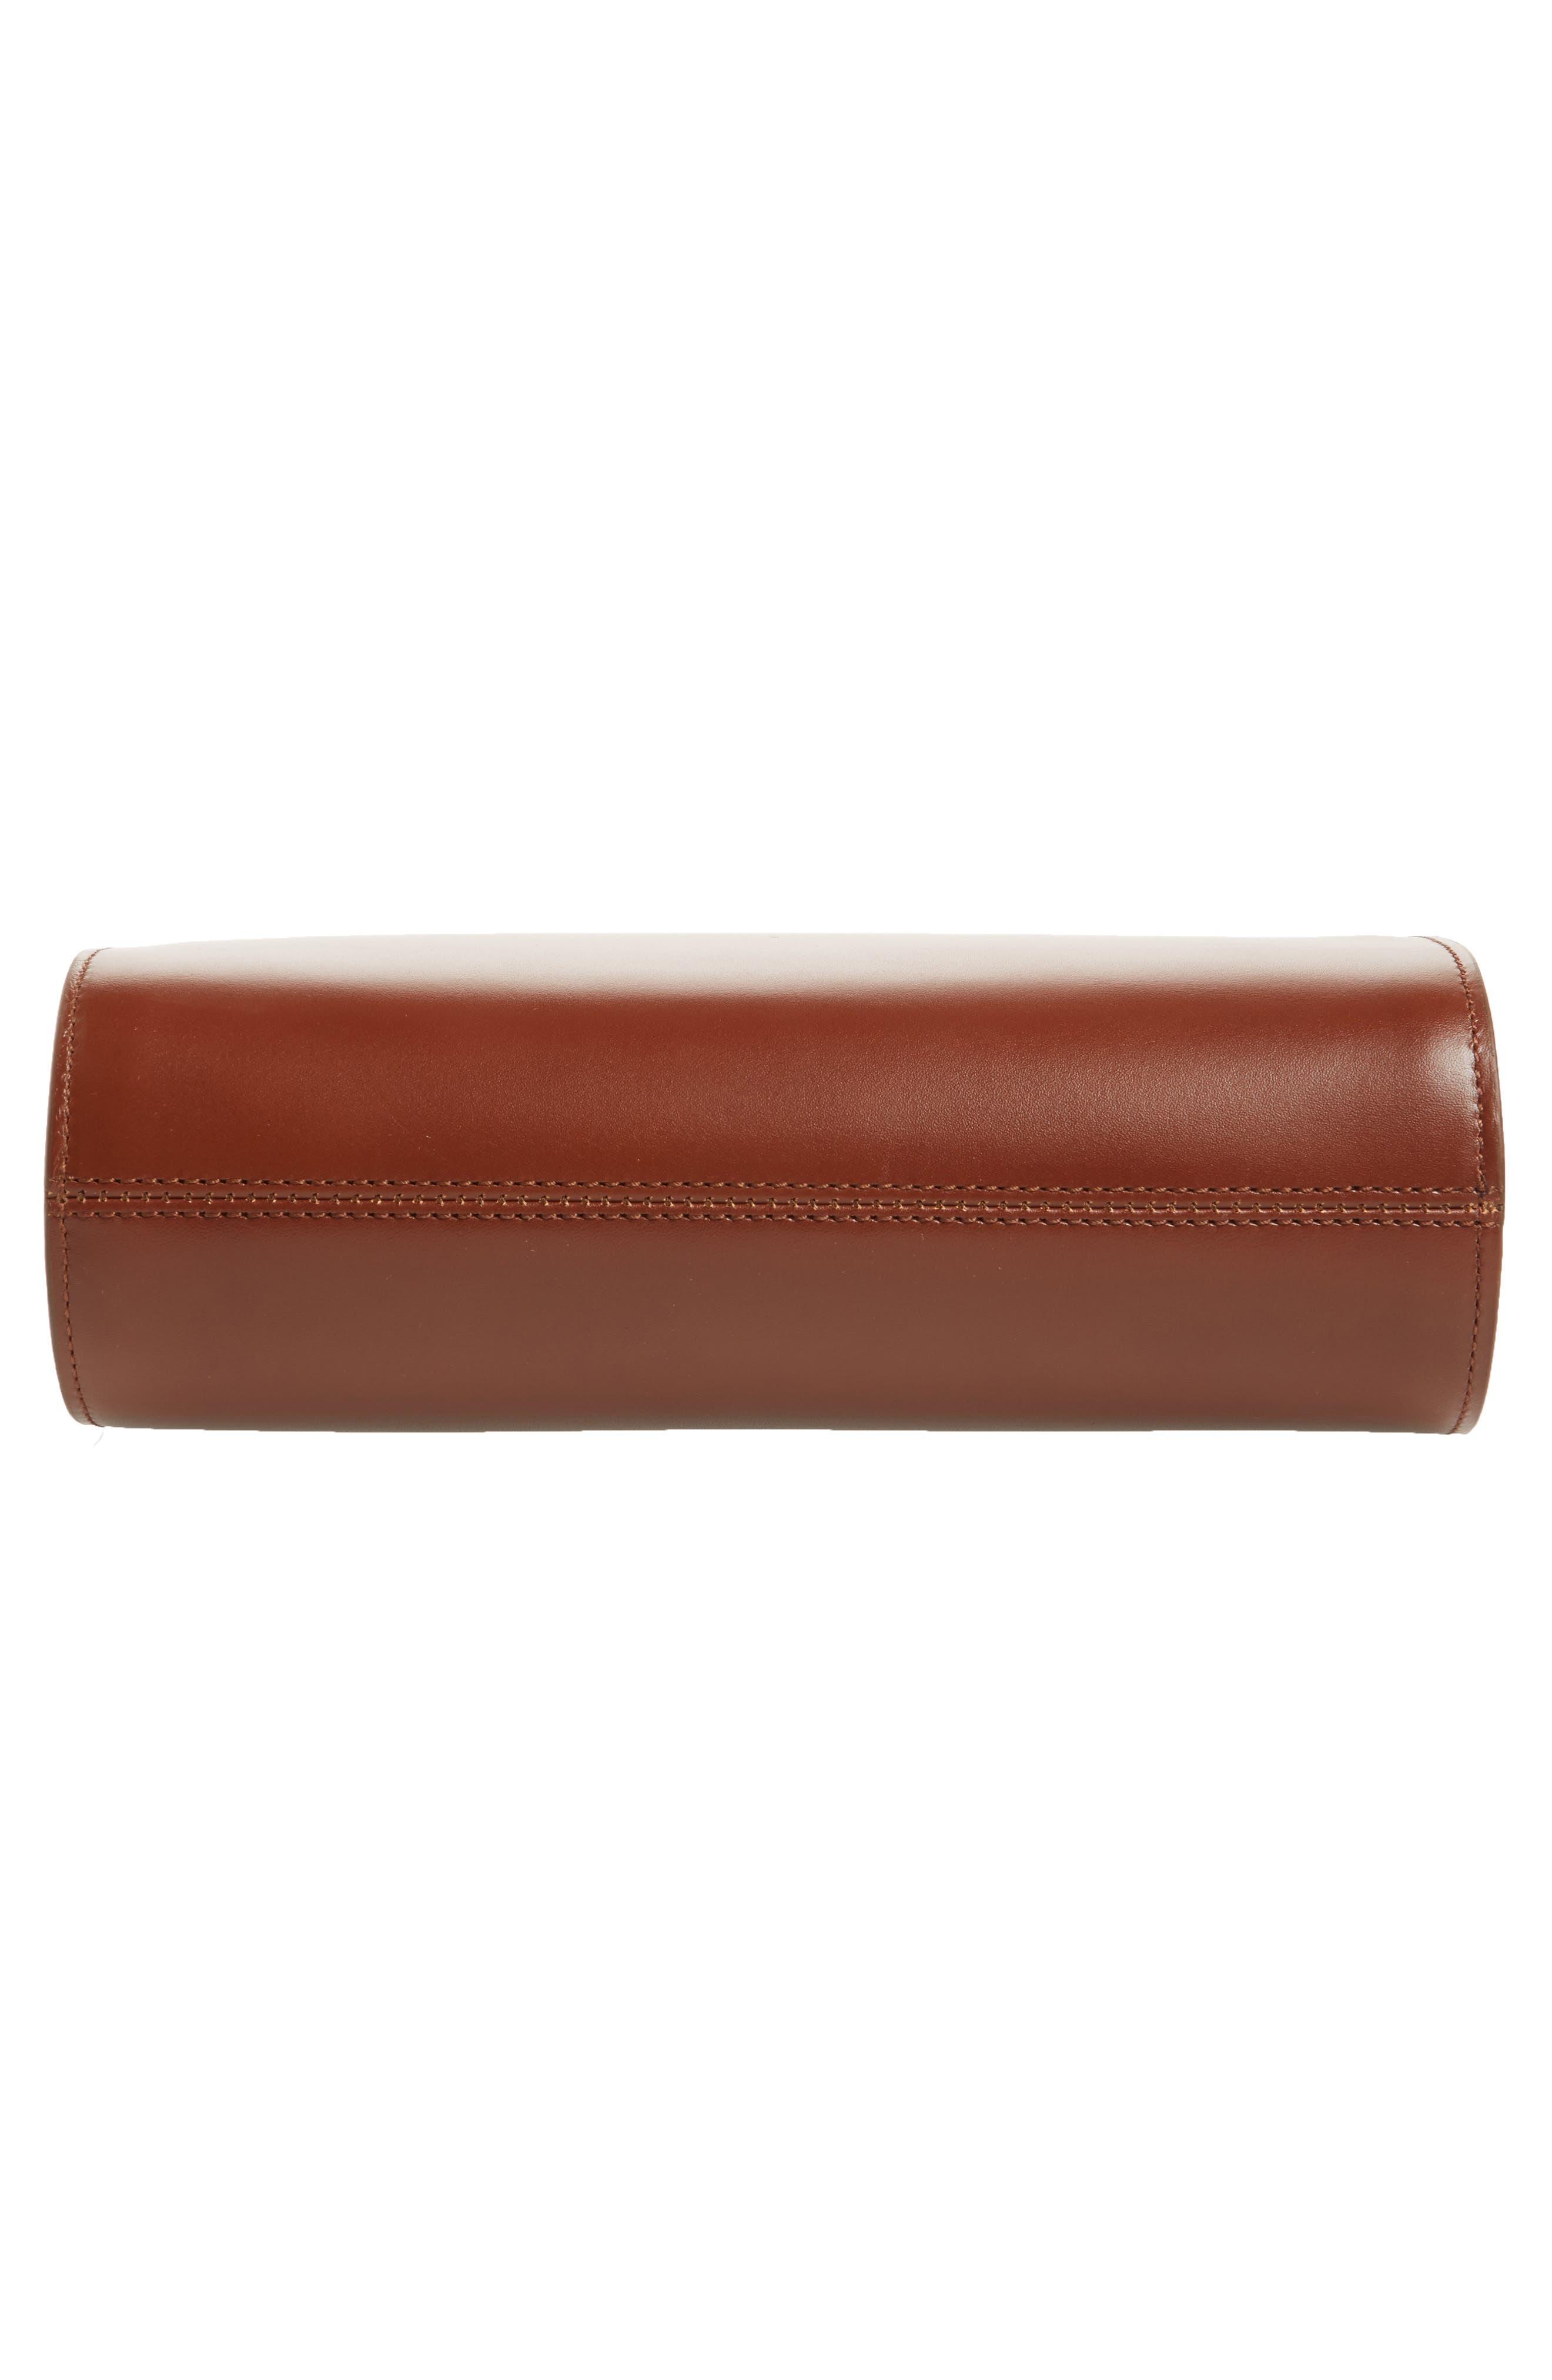 'Sac Demi Lune' Leather Crossbody Bag,                             Alternate thumbnail 6, color,                             NOISETTE